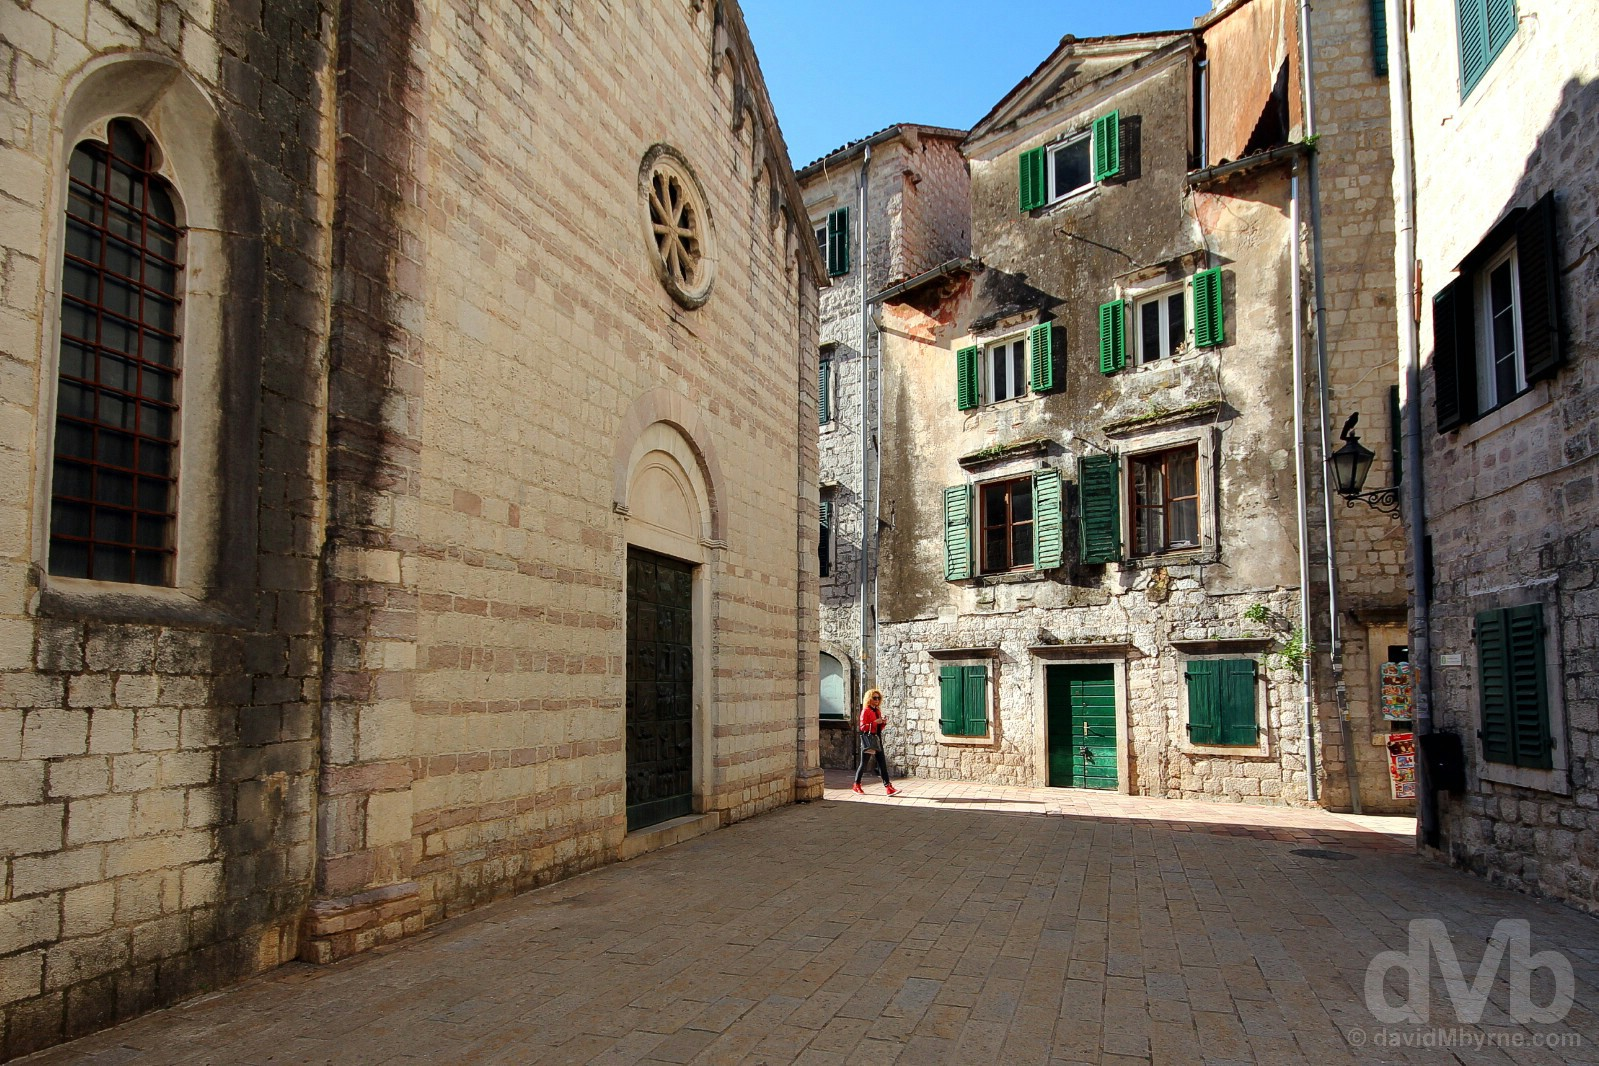 Off Trg od Drva (Tree Square) in Stari Grad (Old Town), Kotor, Montenegro. April 20, 2017.